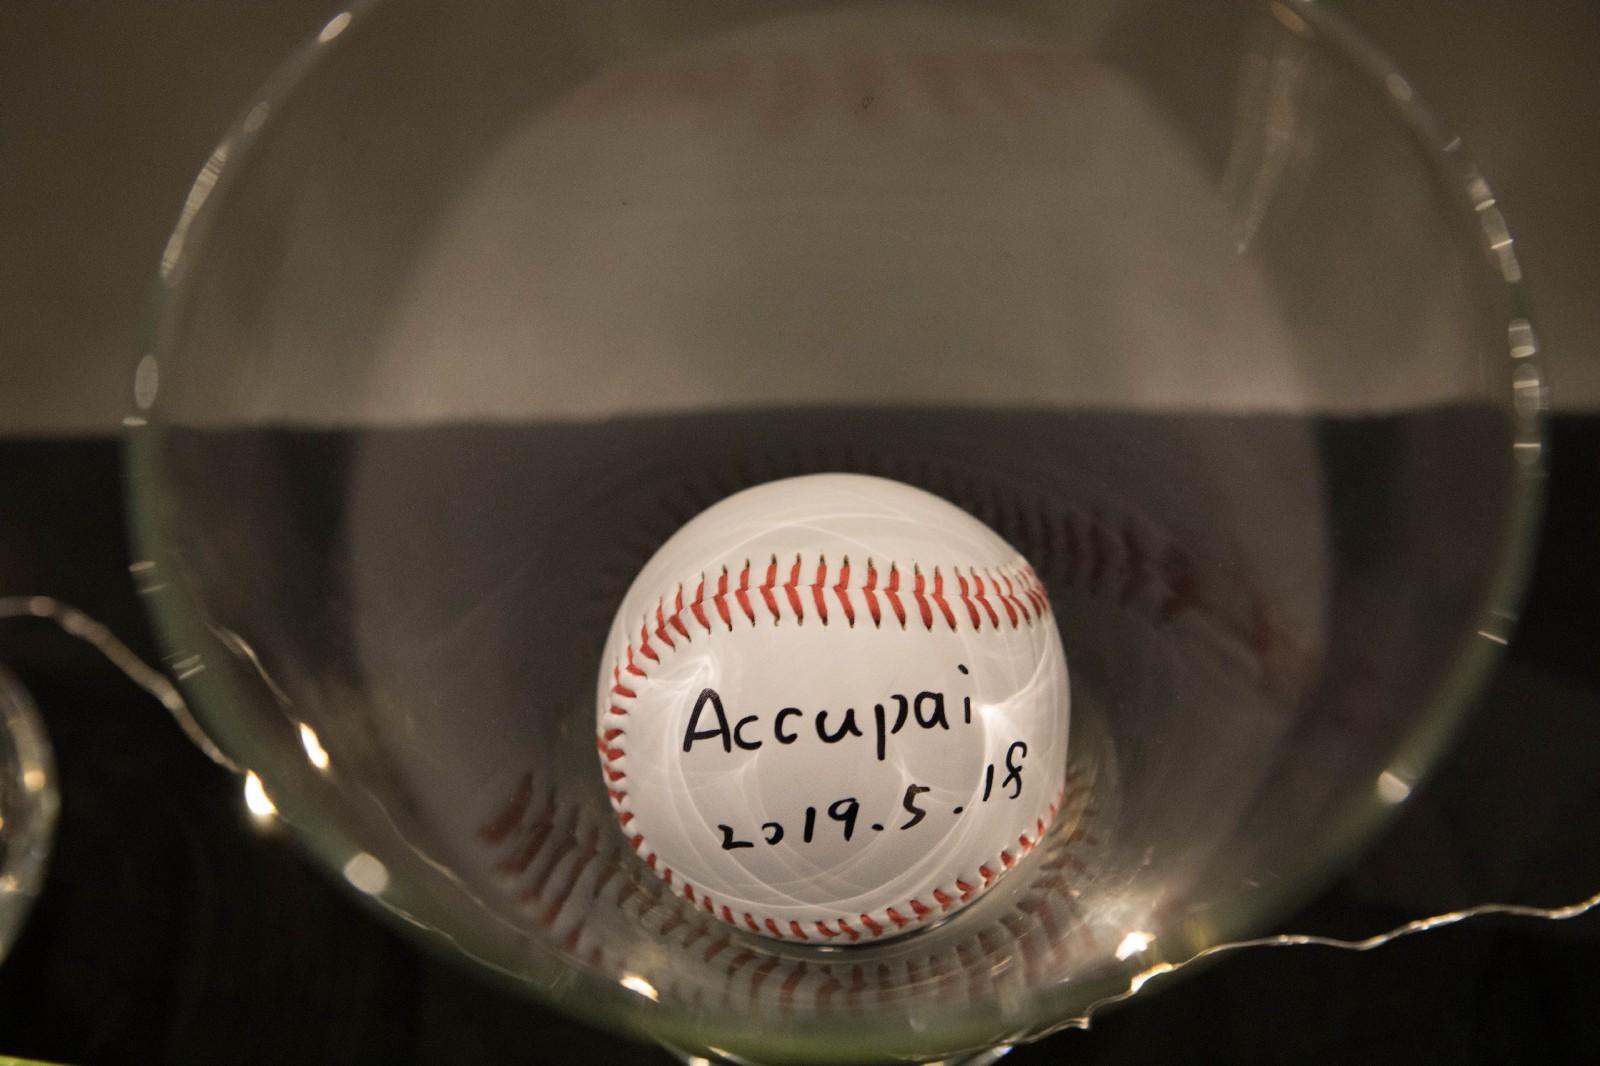 Accupai 雲攝影參加 PitchCamp 2019 的簽名棒球